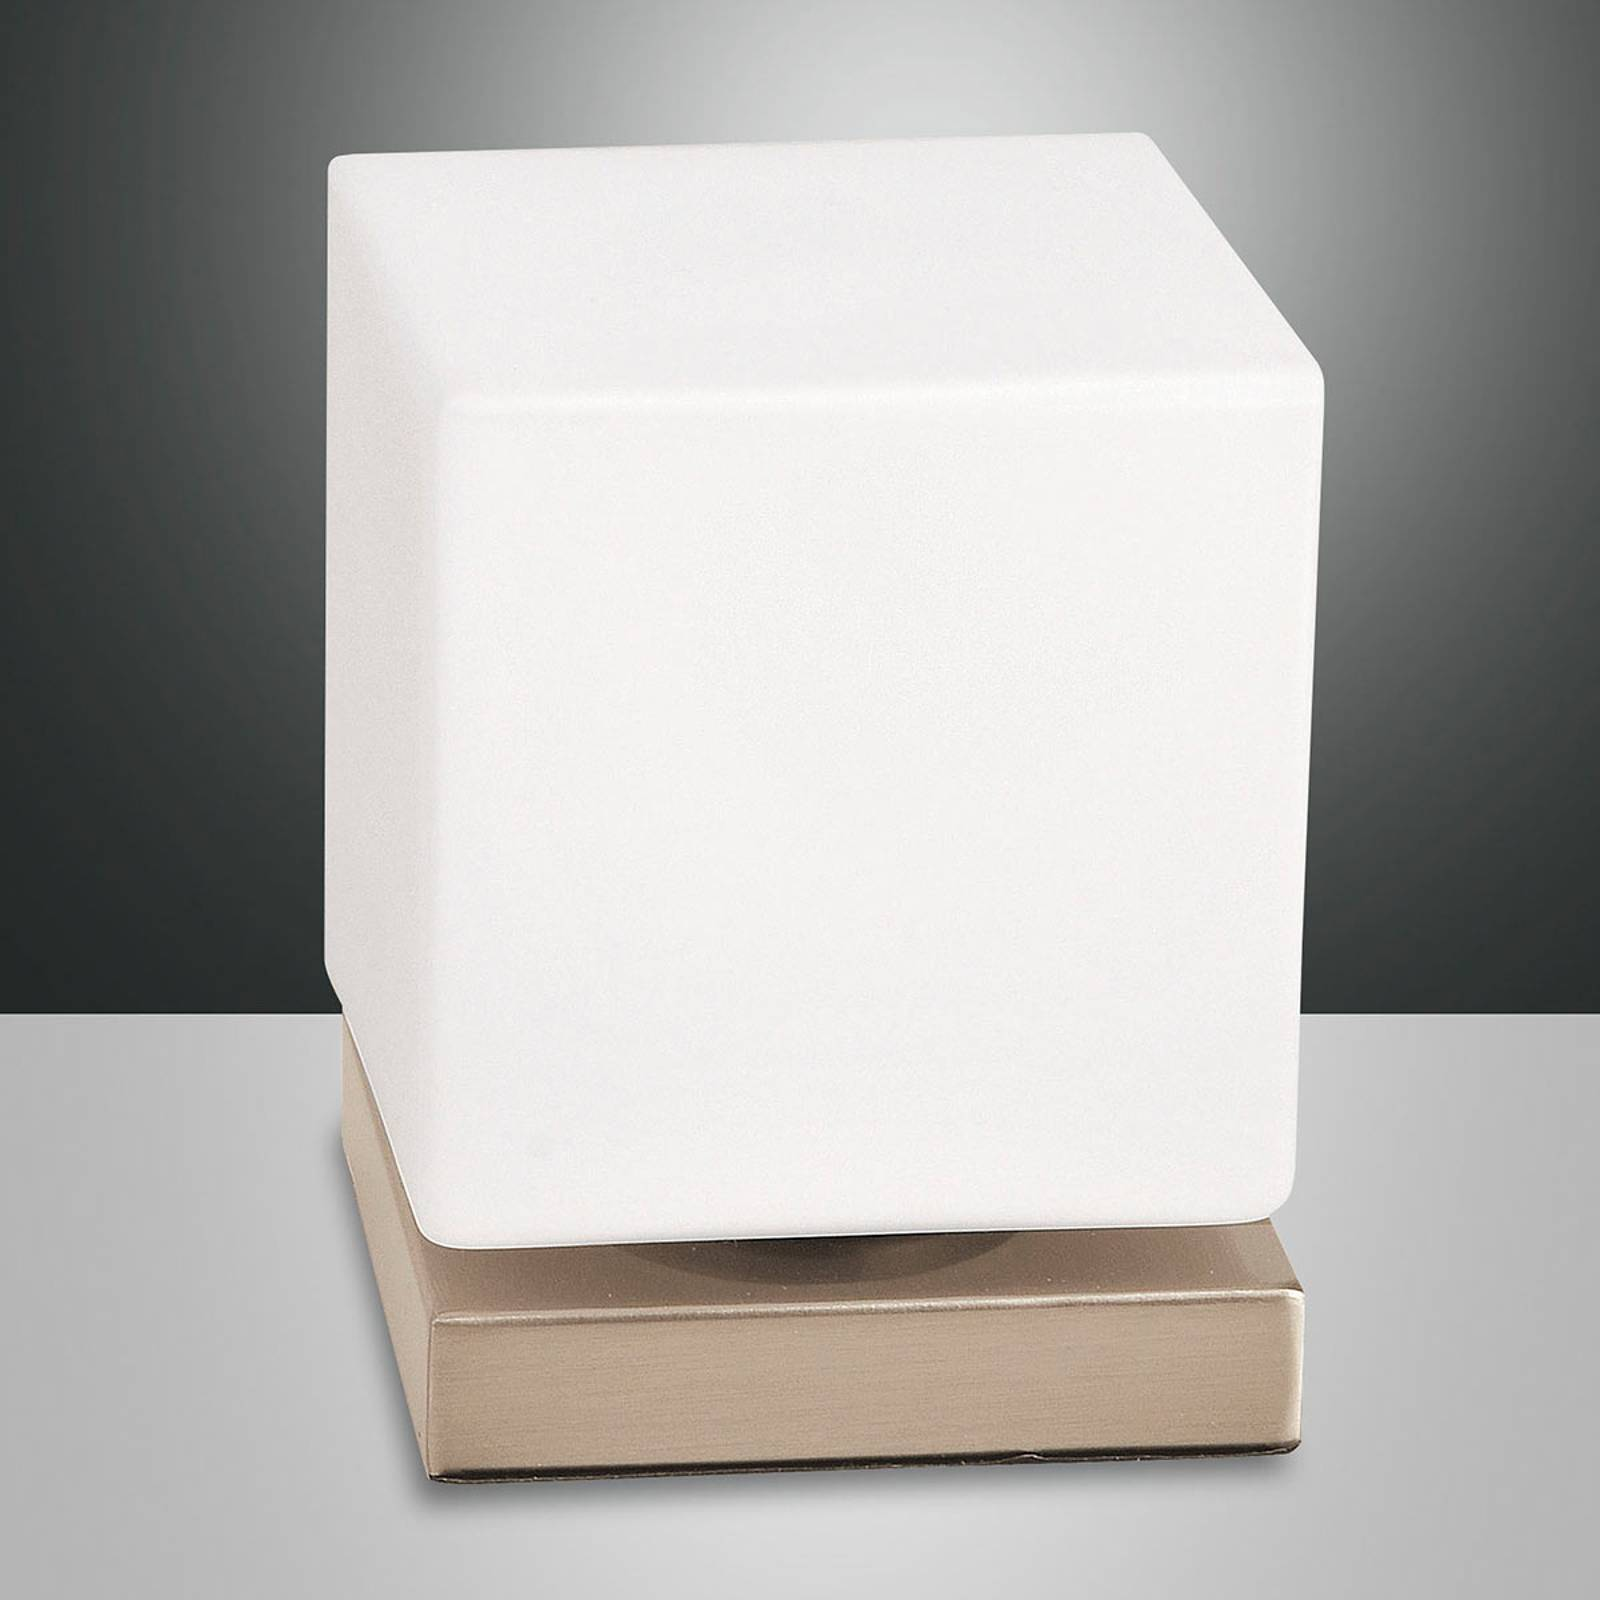 Kosketushimmennin LED-pöytälamppu Brenta kulta